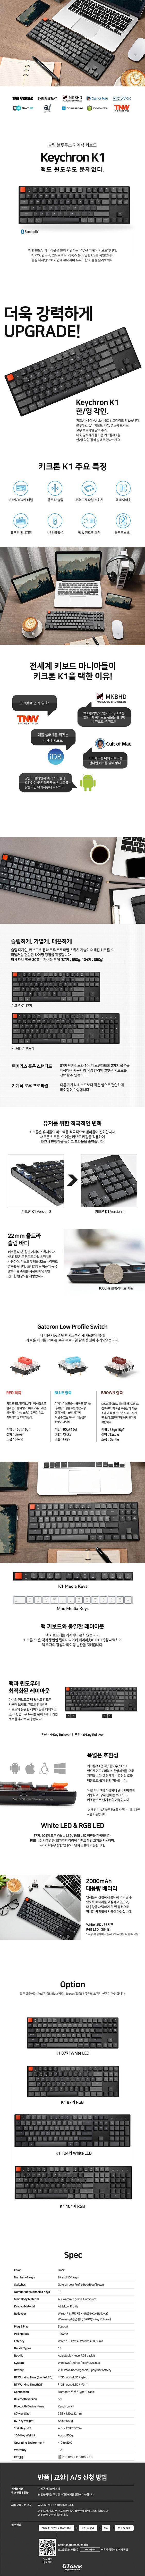 Keychron K1 Version4 텐키리스 WHITE LED (청축)